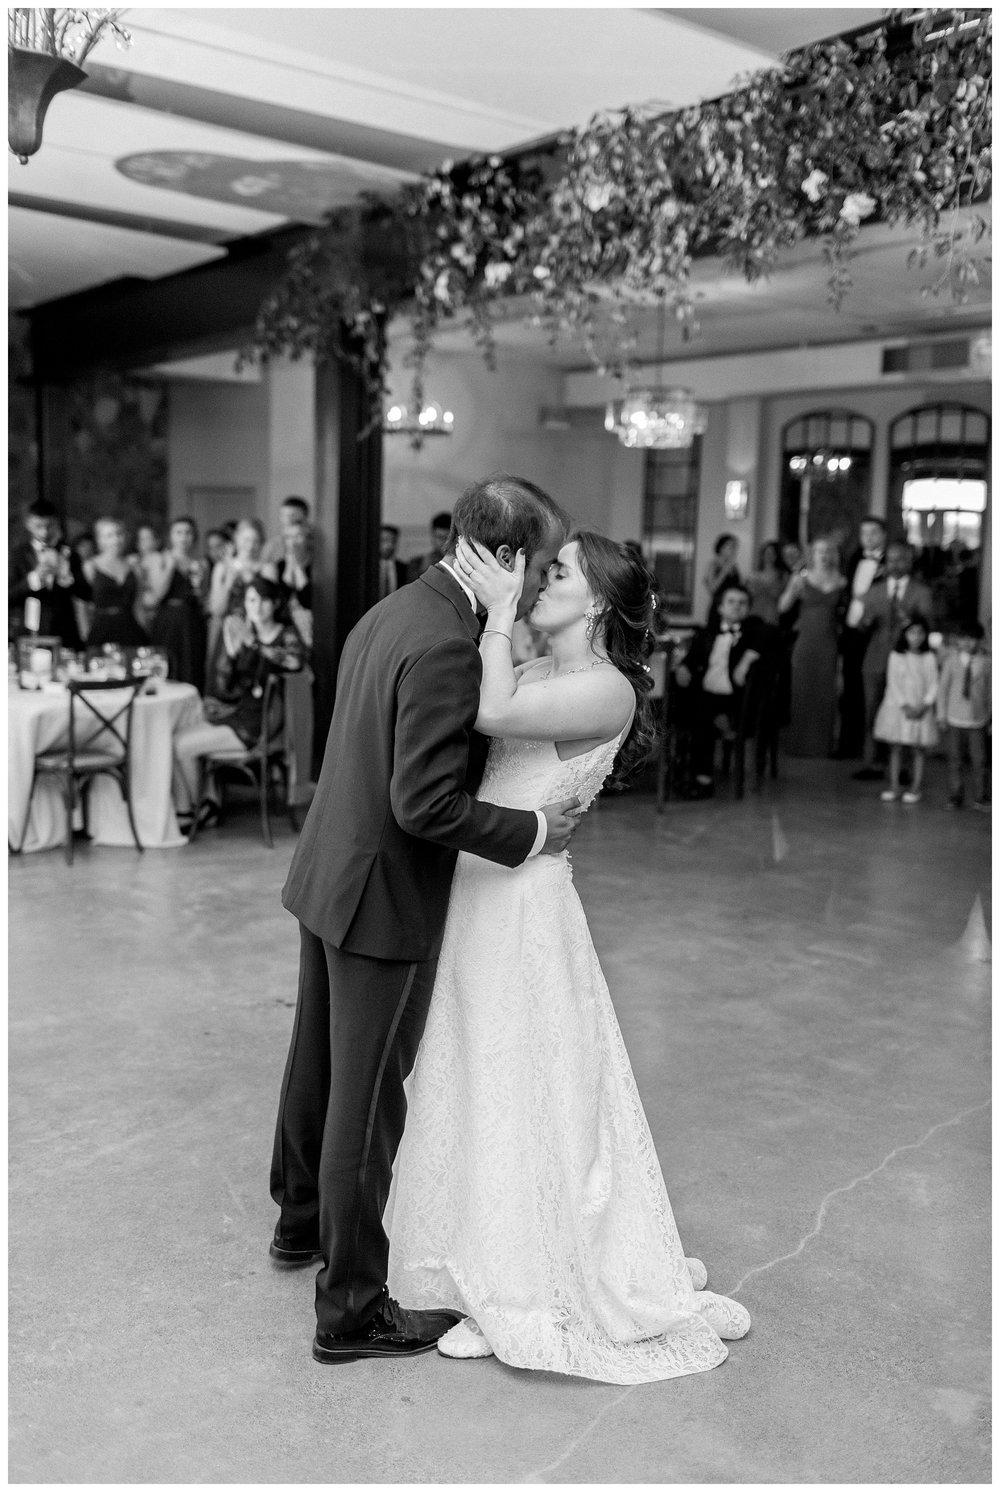 Stone Tower Winery Wedding | Virginia Winter Wedding | VA Wedding Photographer Kir Tuben_0098.jpg